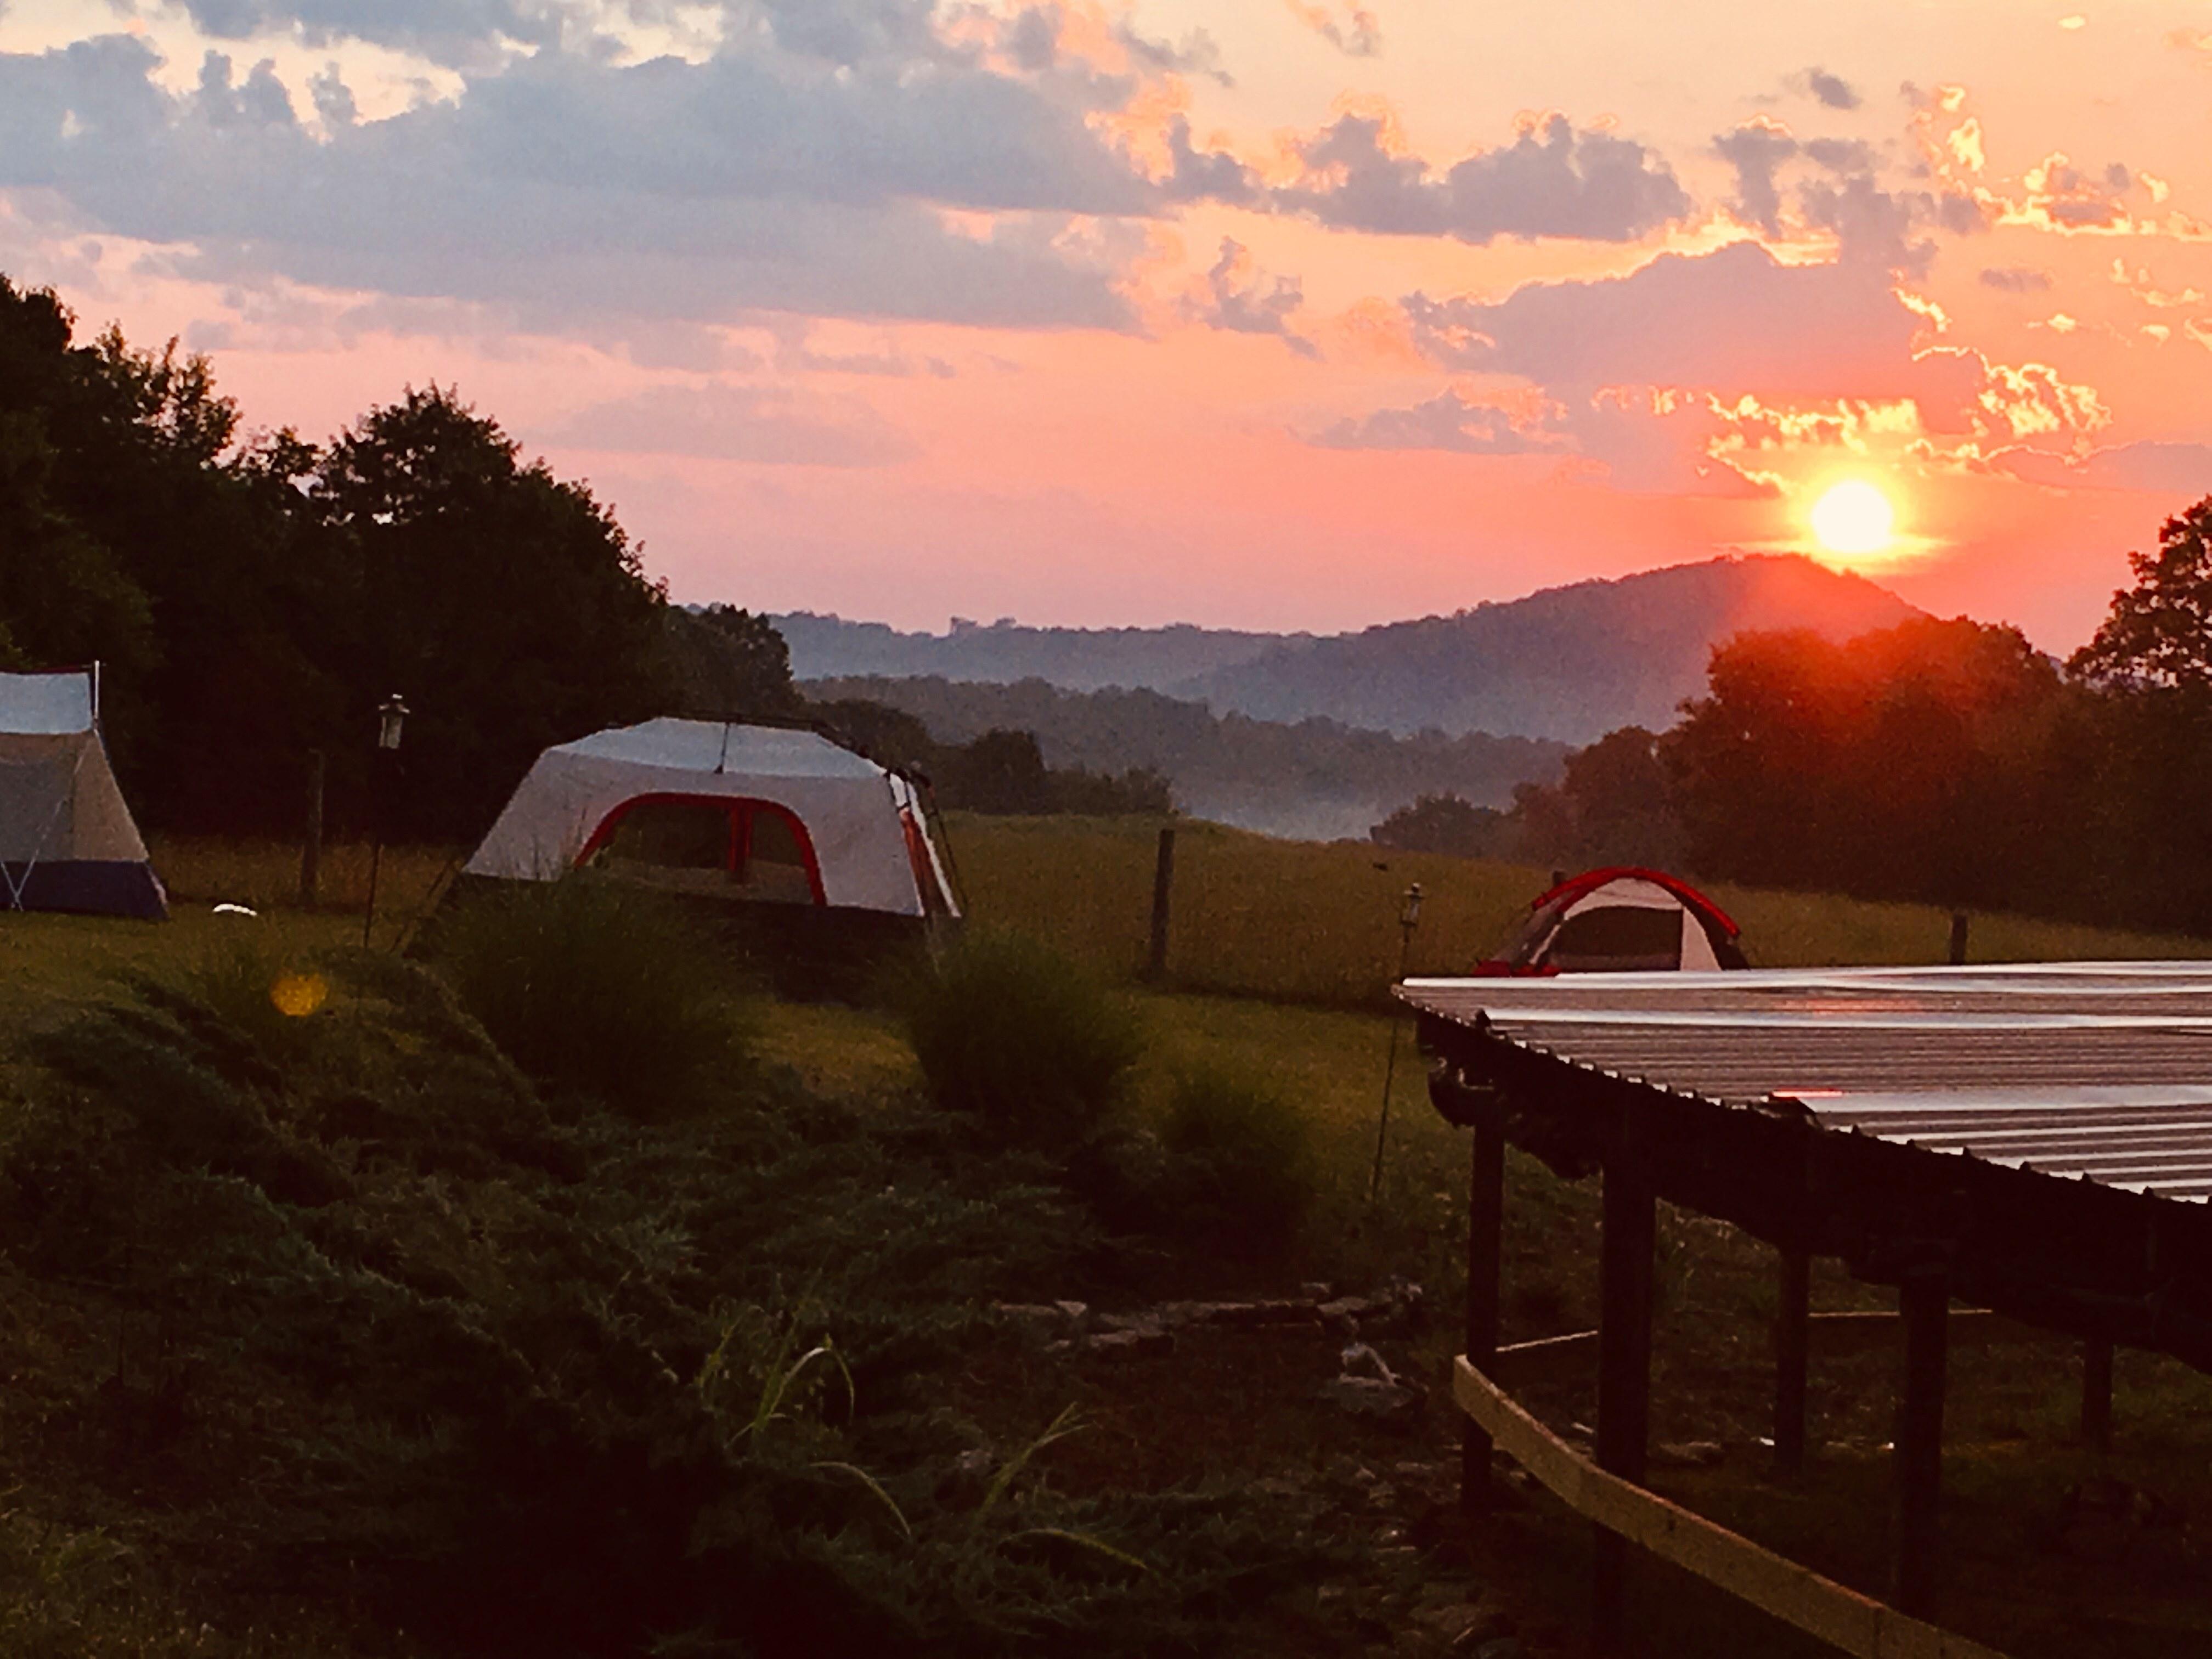 Sunset at Buckeye Farm